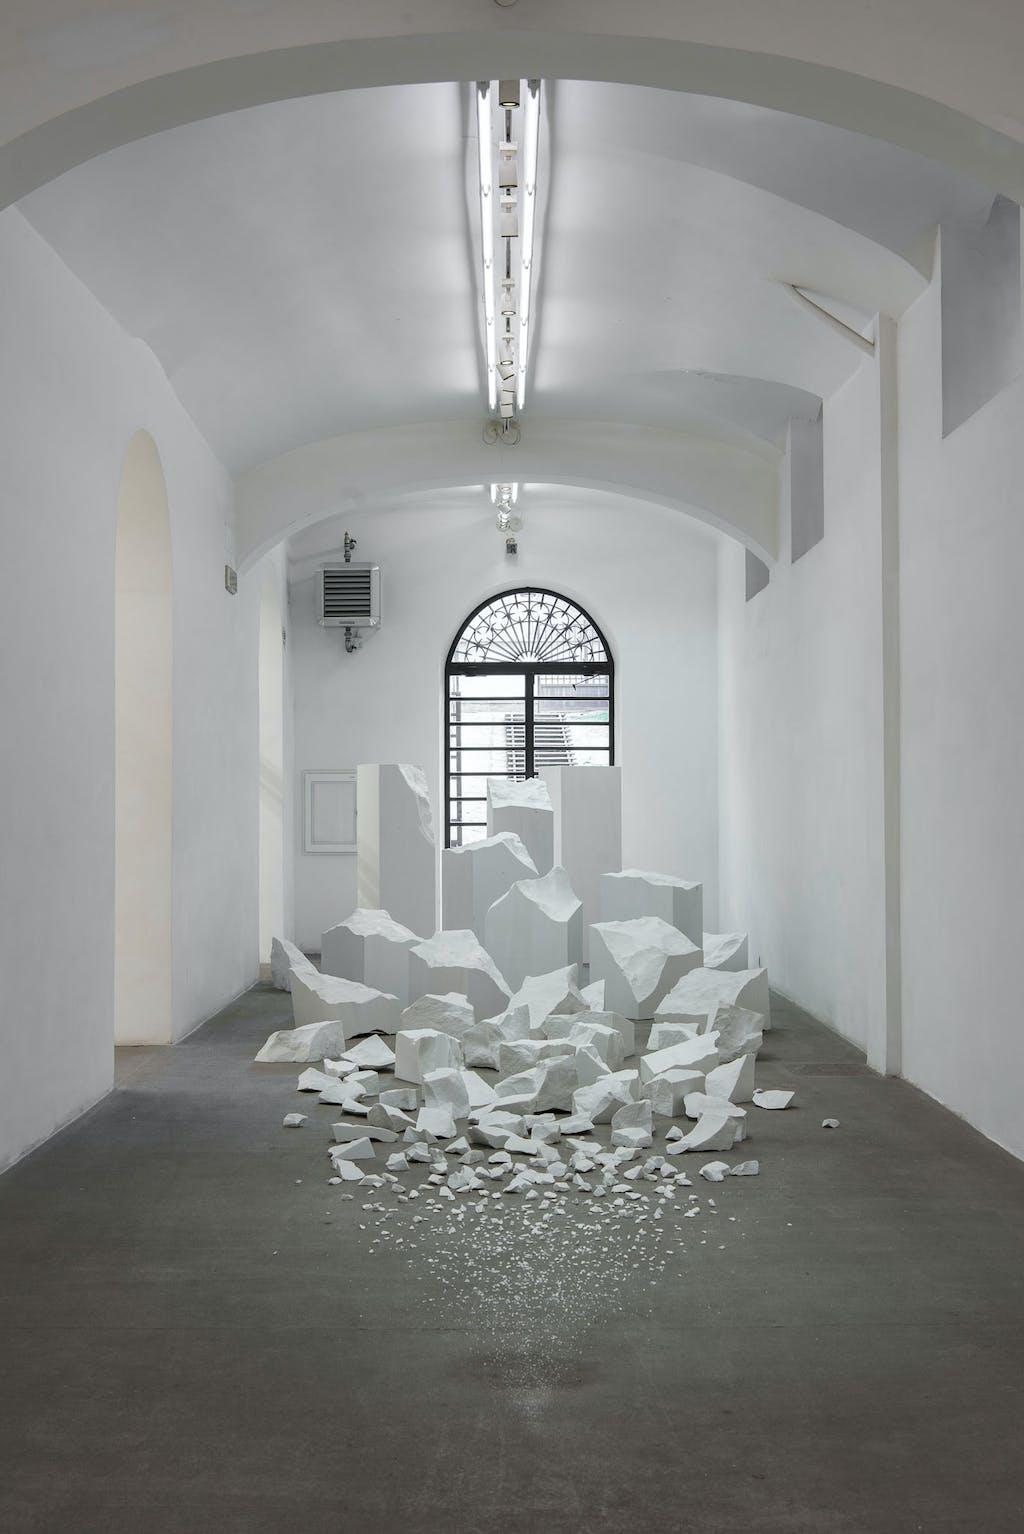 Exhibition view, Fondazione Giuliani, Rome - © kamel mennour